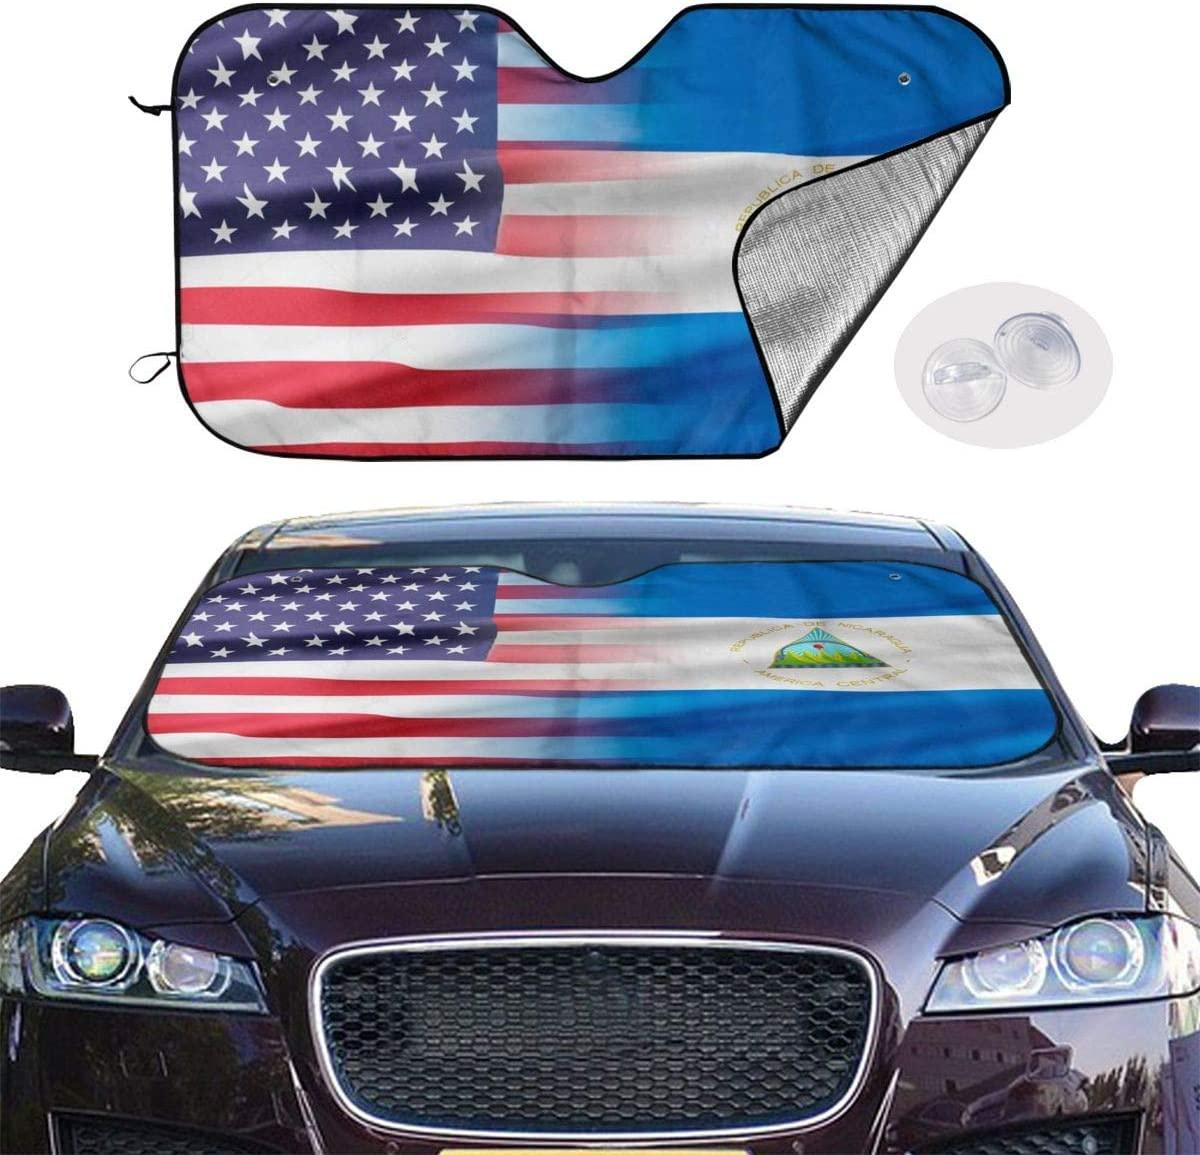 THONFIRE Car Windshields Sun Shades USA and Nicaragua Flag Blocks Heat Keeps Your Vehicle Cool Visor Protector Trucks Front Window Heatshield